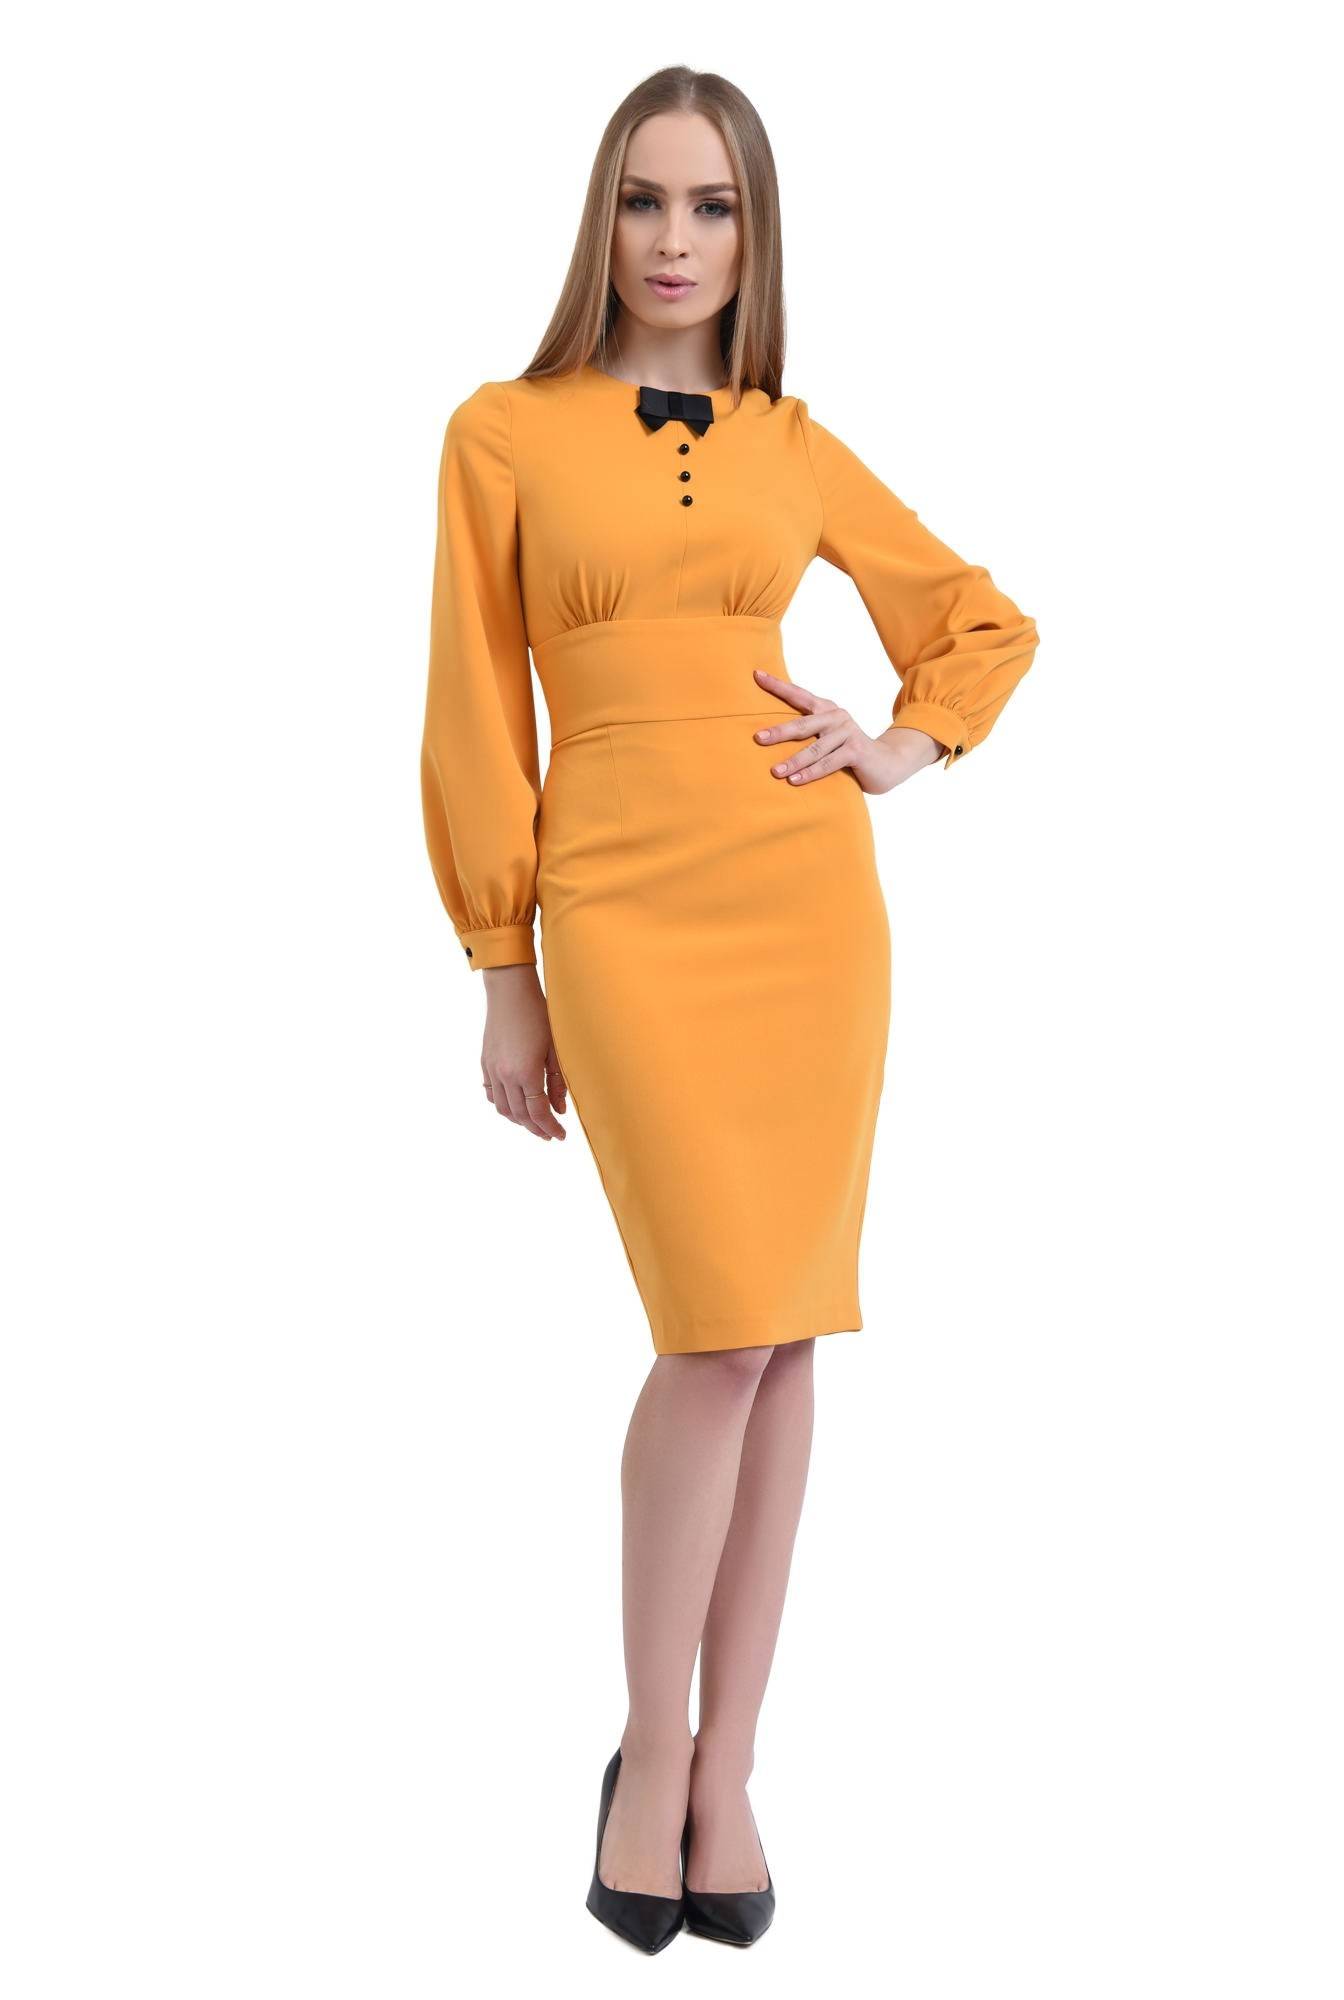 3 - 360 - rochie conica, maneci bufante, mansete, rochii online, funda, nasturi, contrast